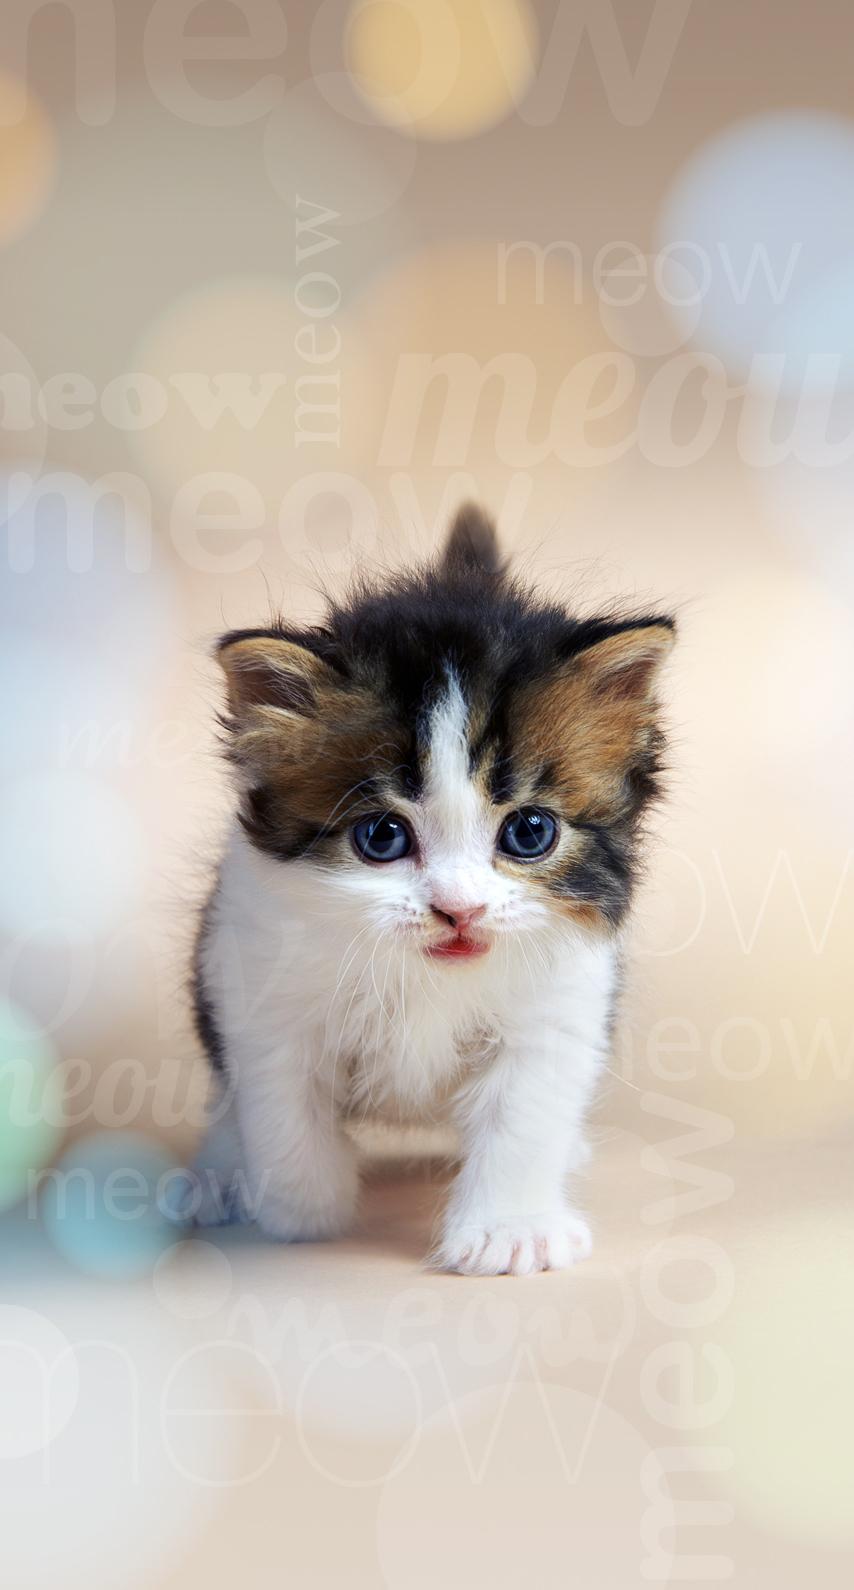 celebration, kitten, fur, animal, portrait, mammal, sit, little, young, baby, downy, looking, curiosity